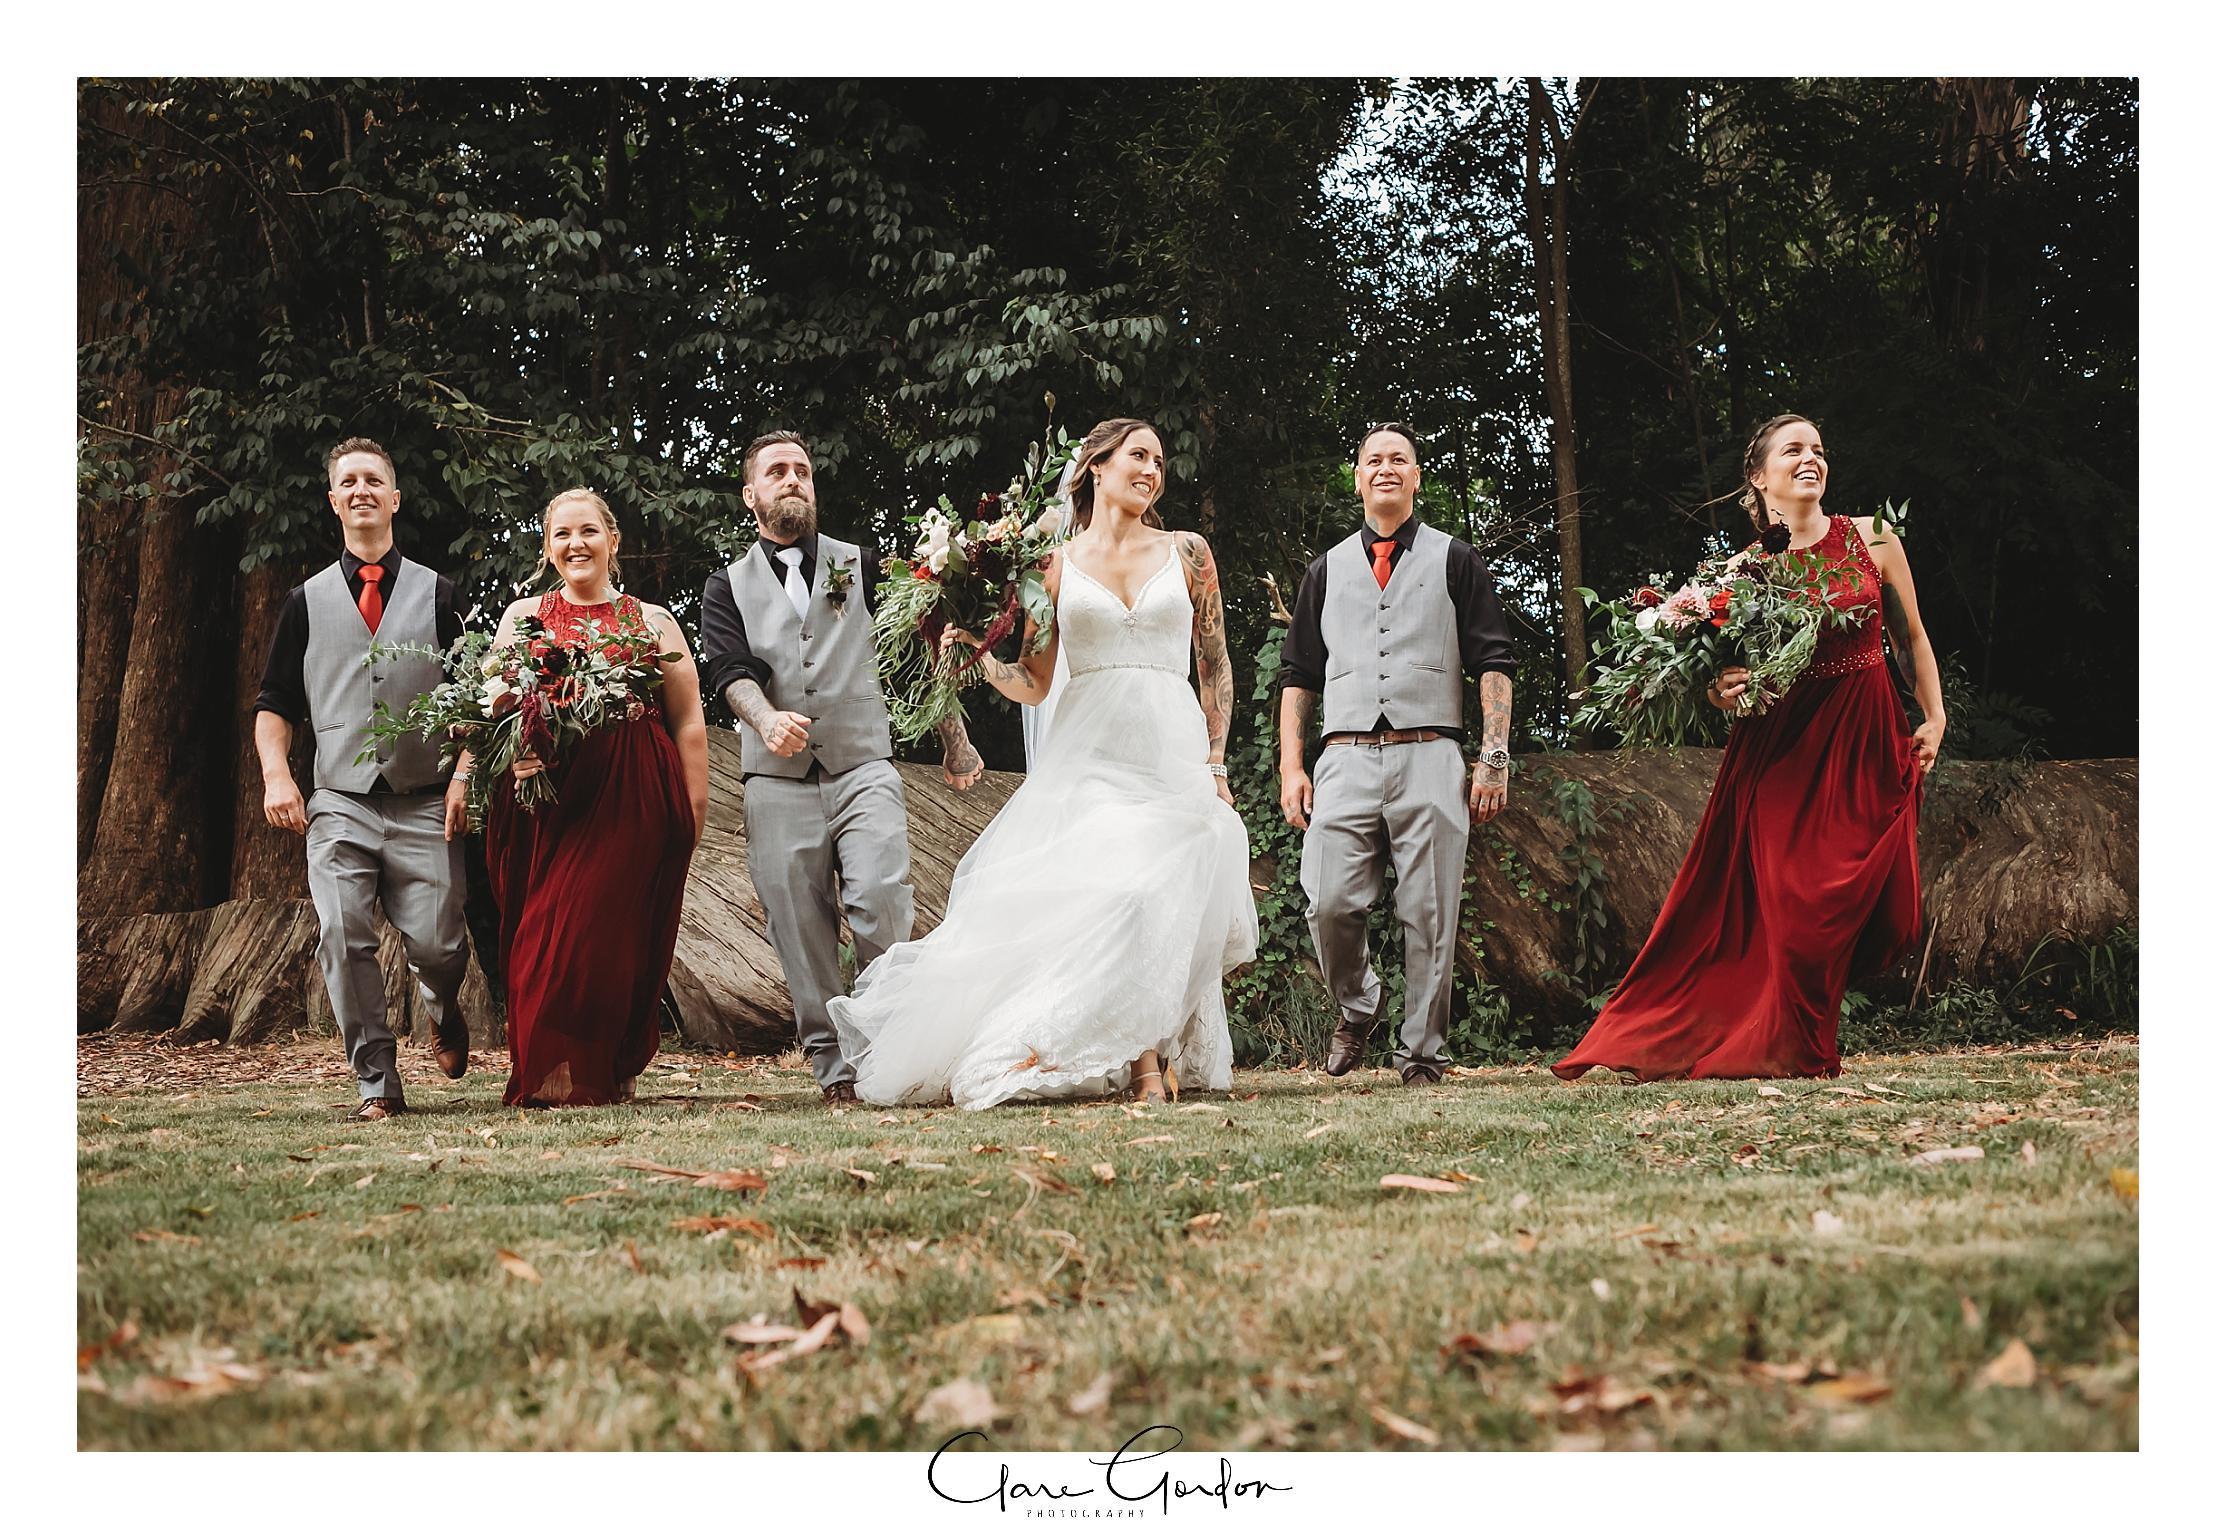 Waikato-wedding-photographer-Forest-weddnig-Hamilton-wedding-Newzealand (78).jpg